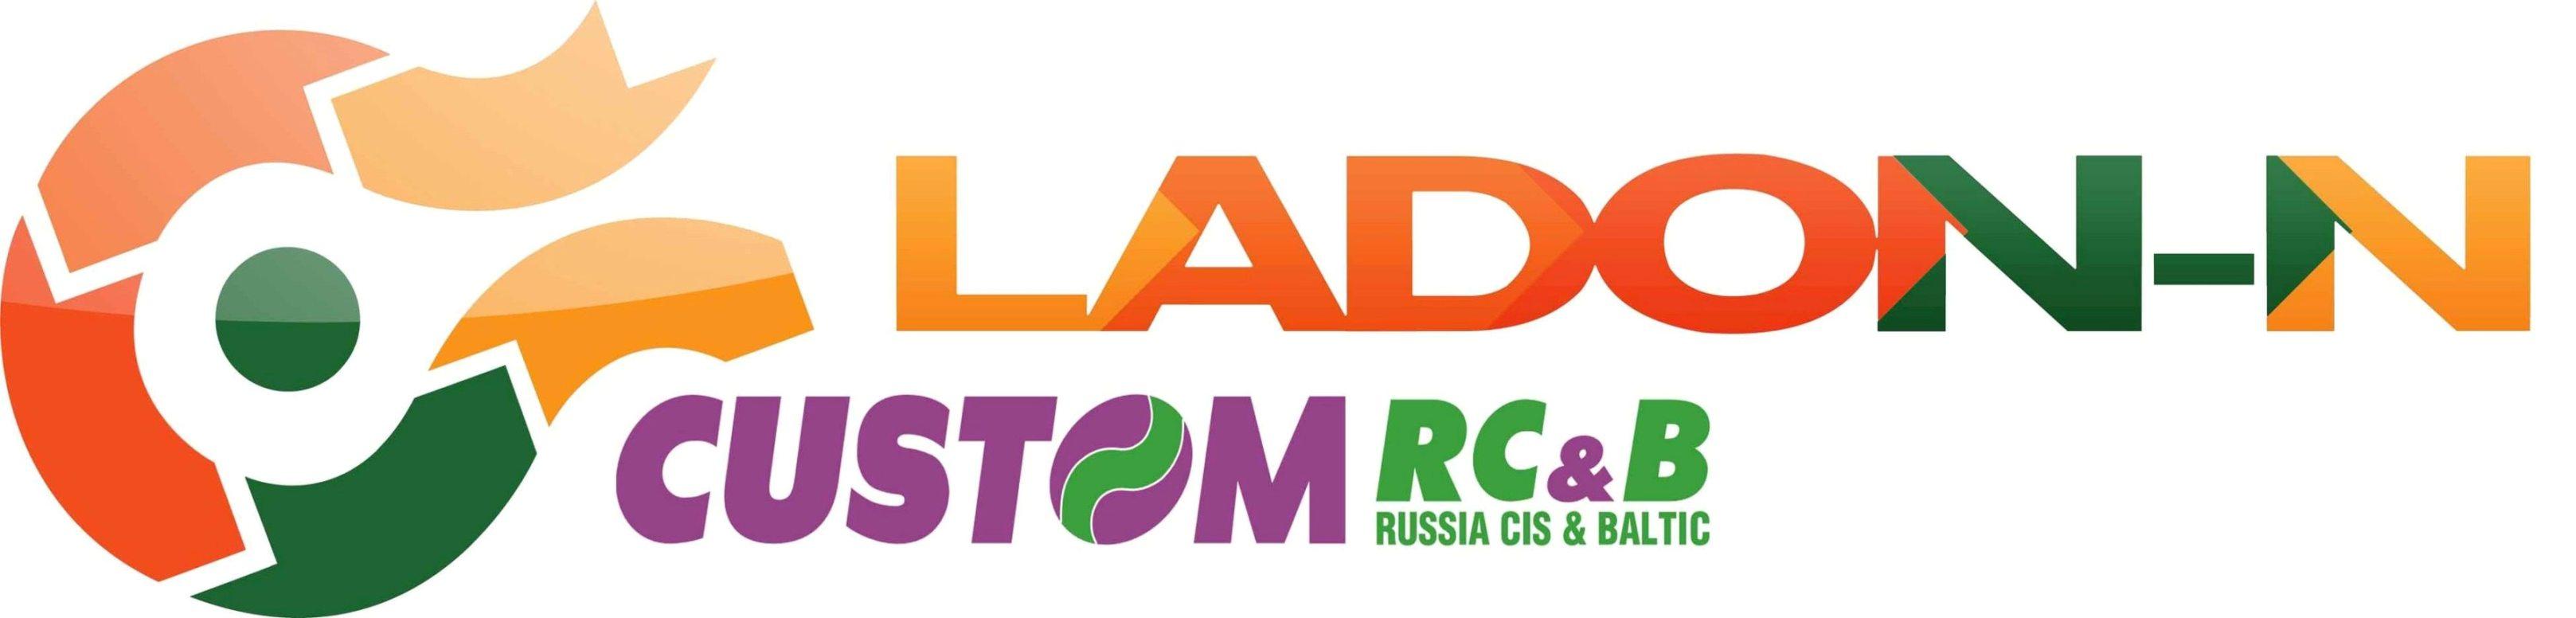 Ладон-Н/Custom RC&B